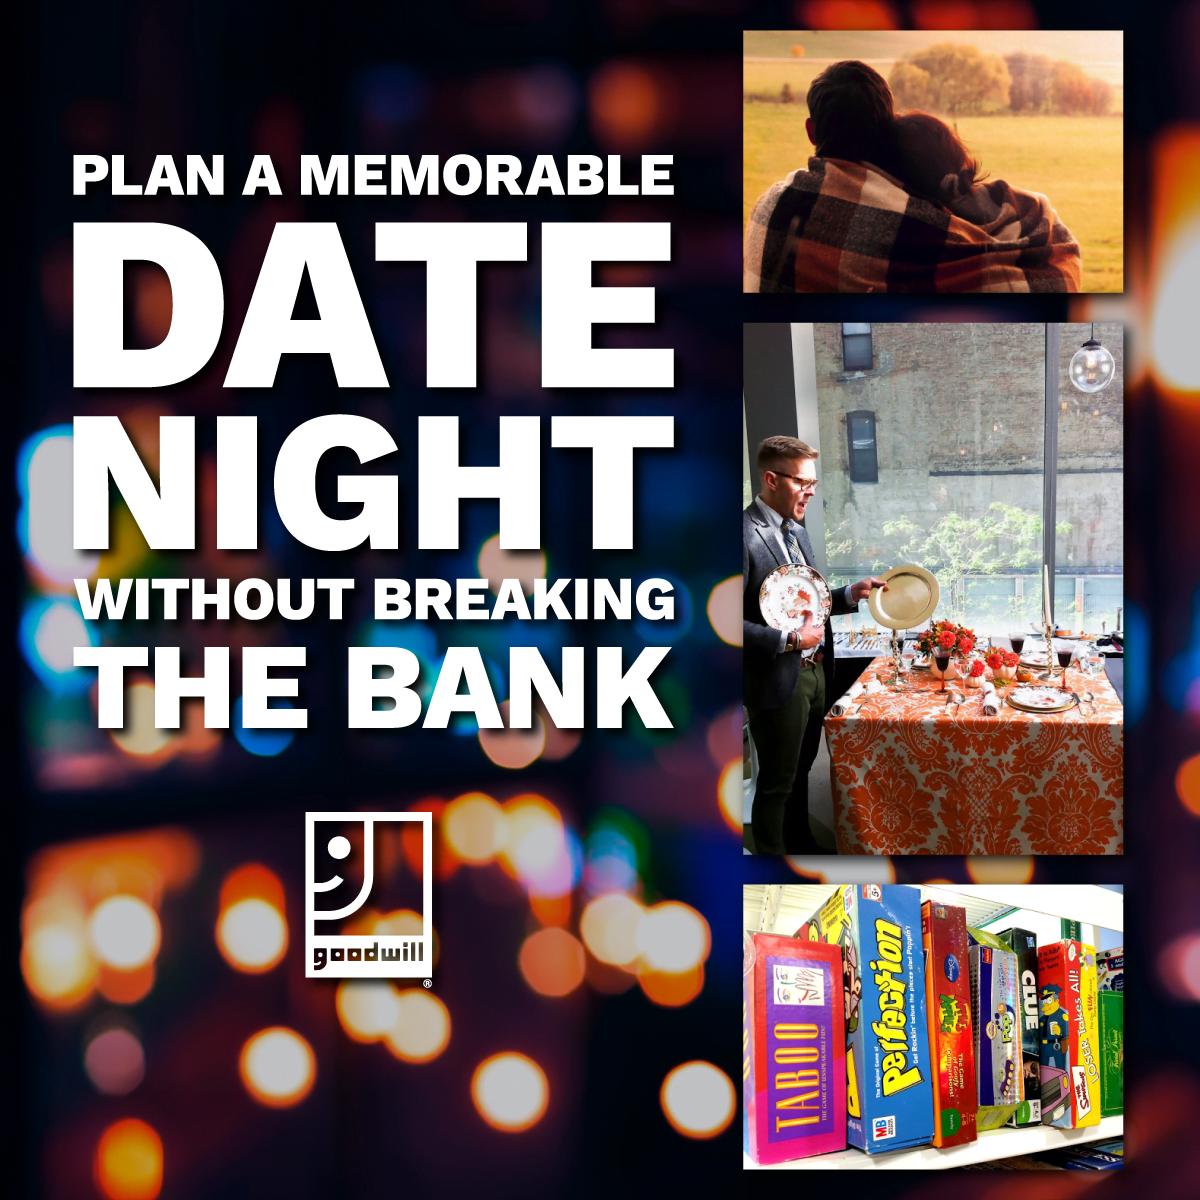 plan a date night blog post